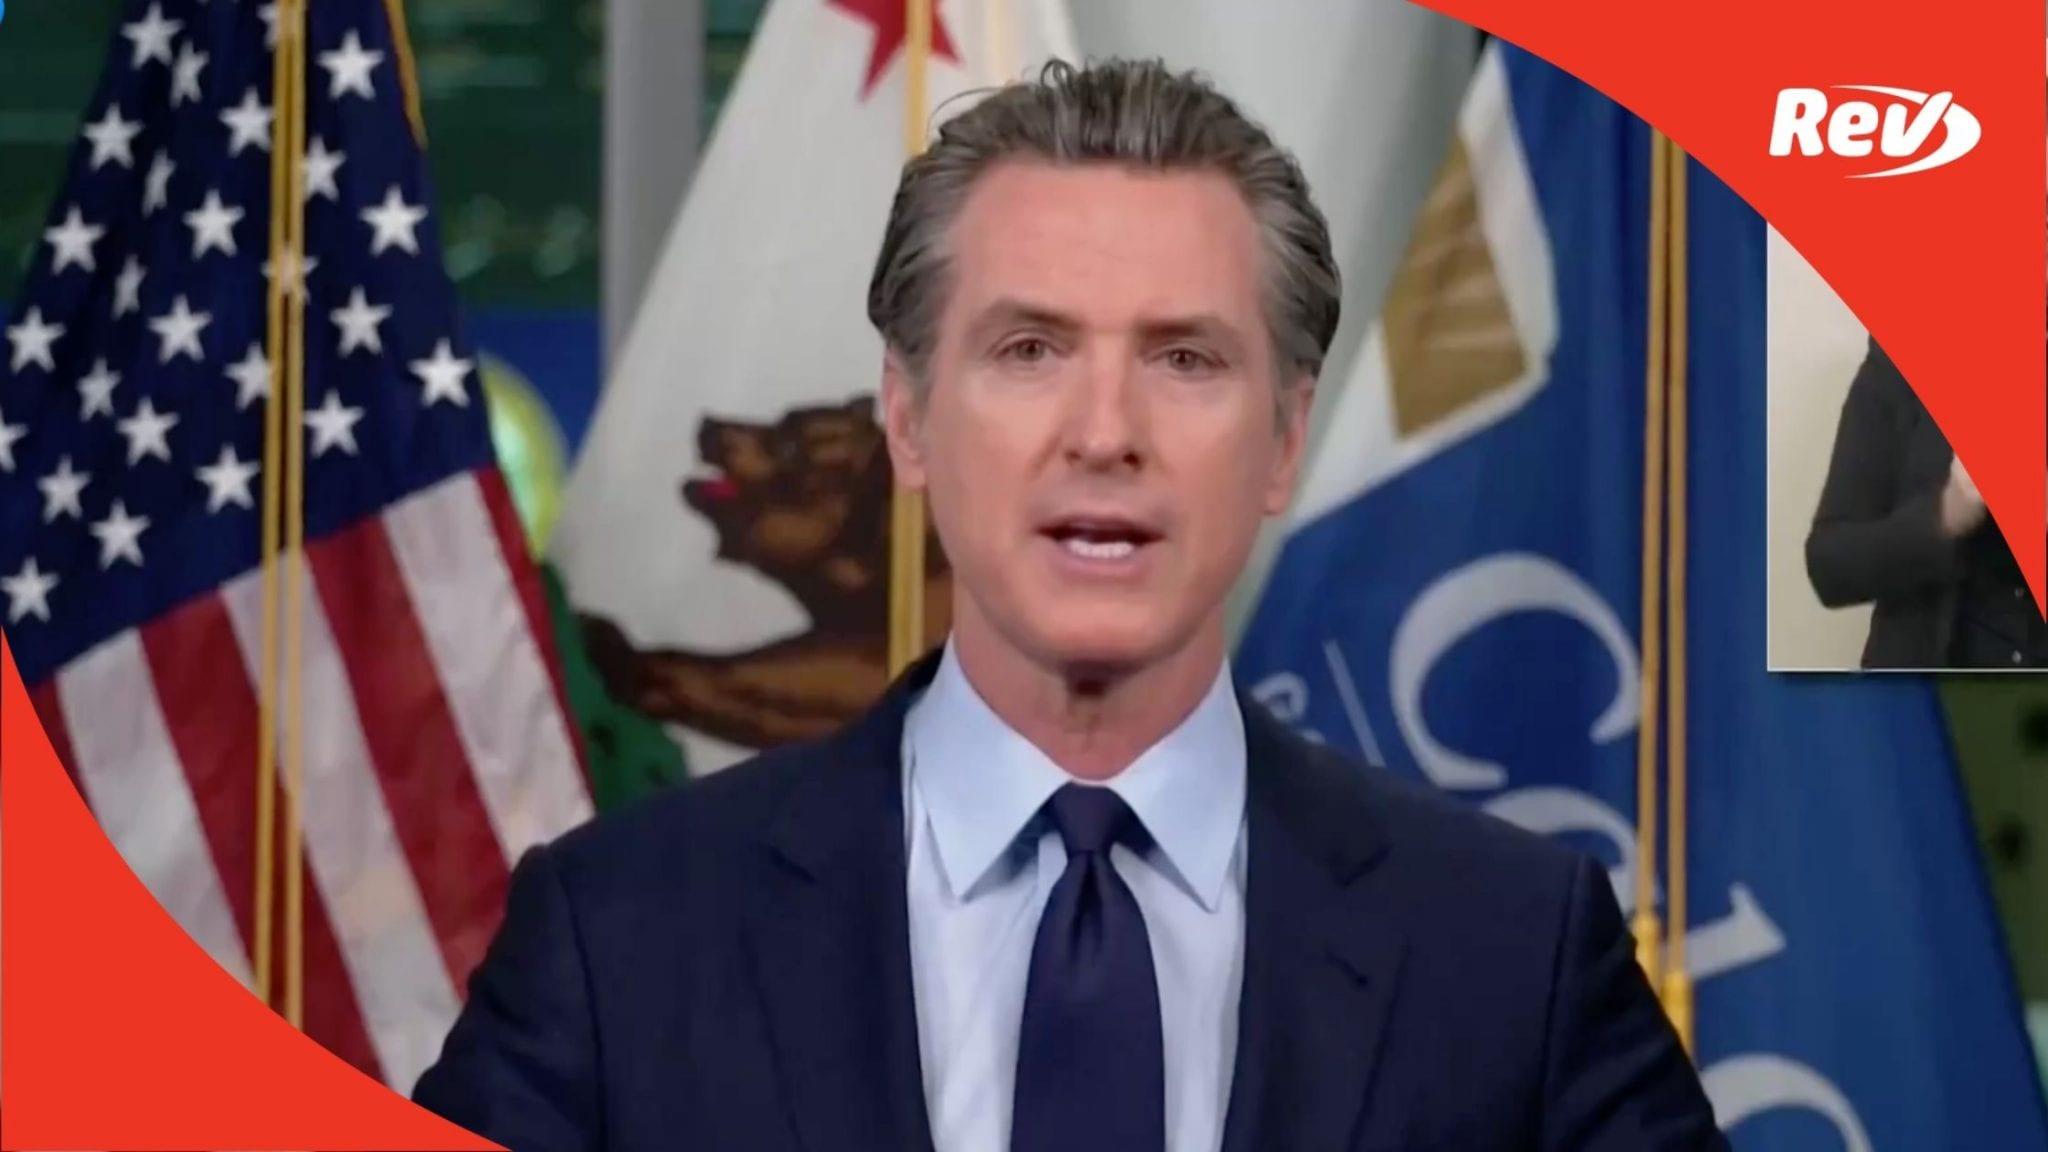 California Gov. Gavin Newsom COVID-19 Press Conference Transcript December 7